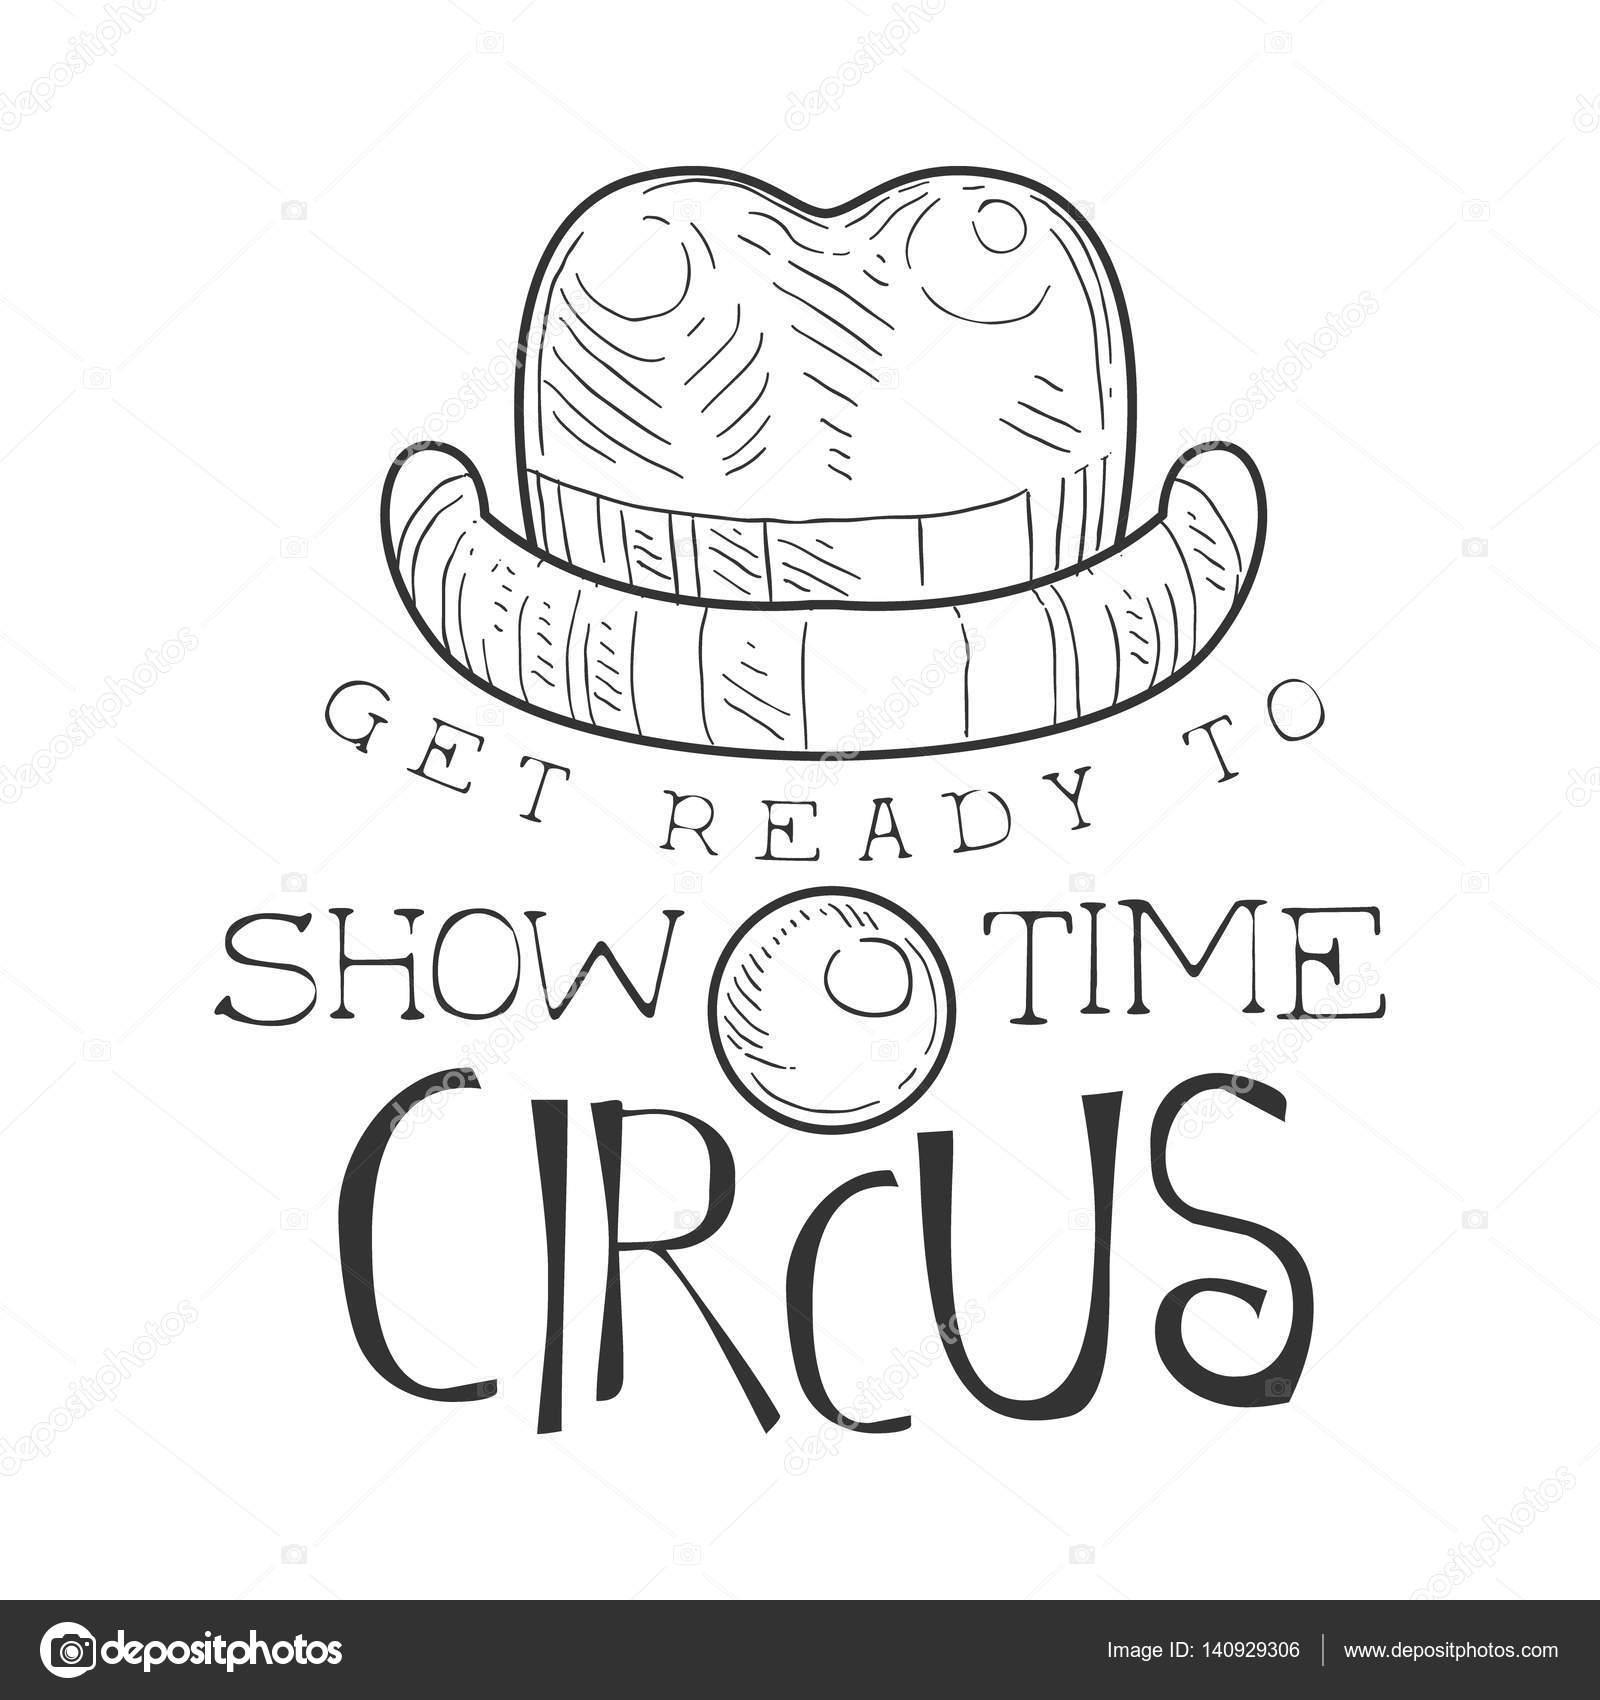 Drawn sign circus With Clown Nose Drawn Circus